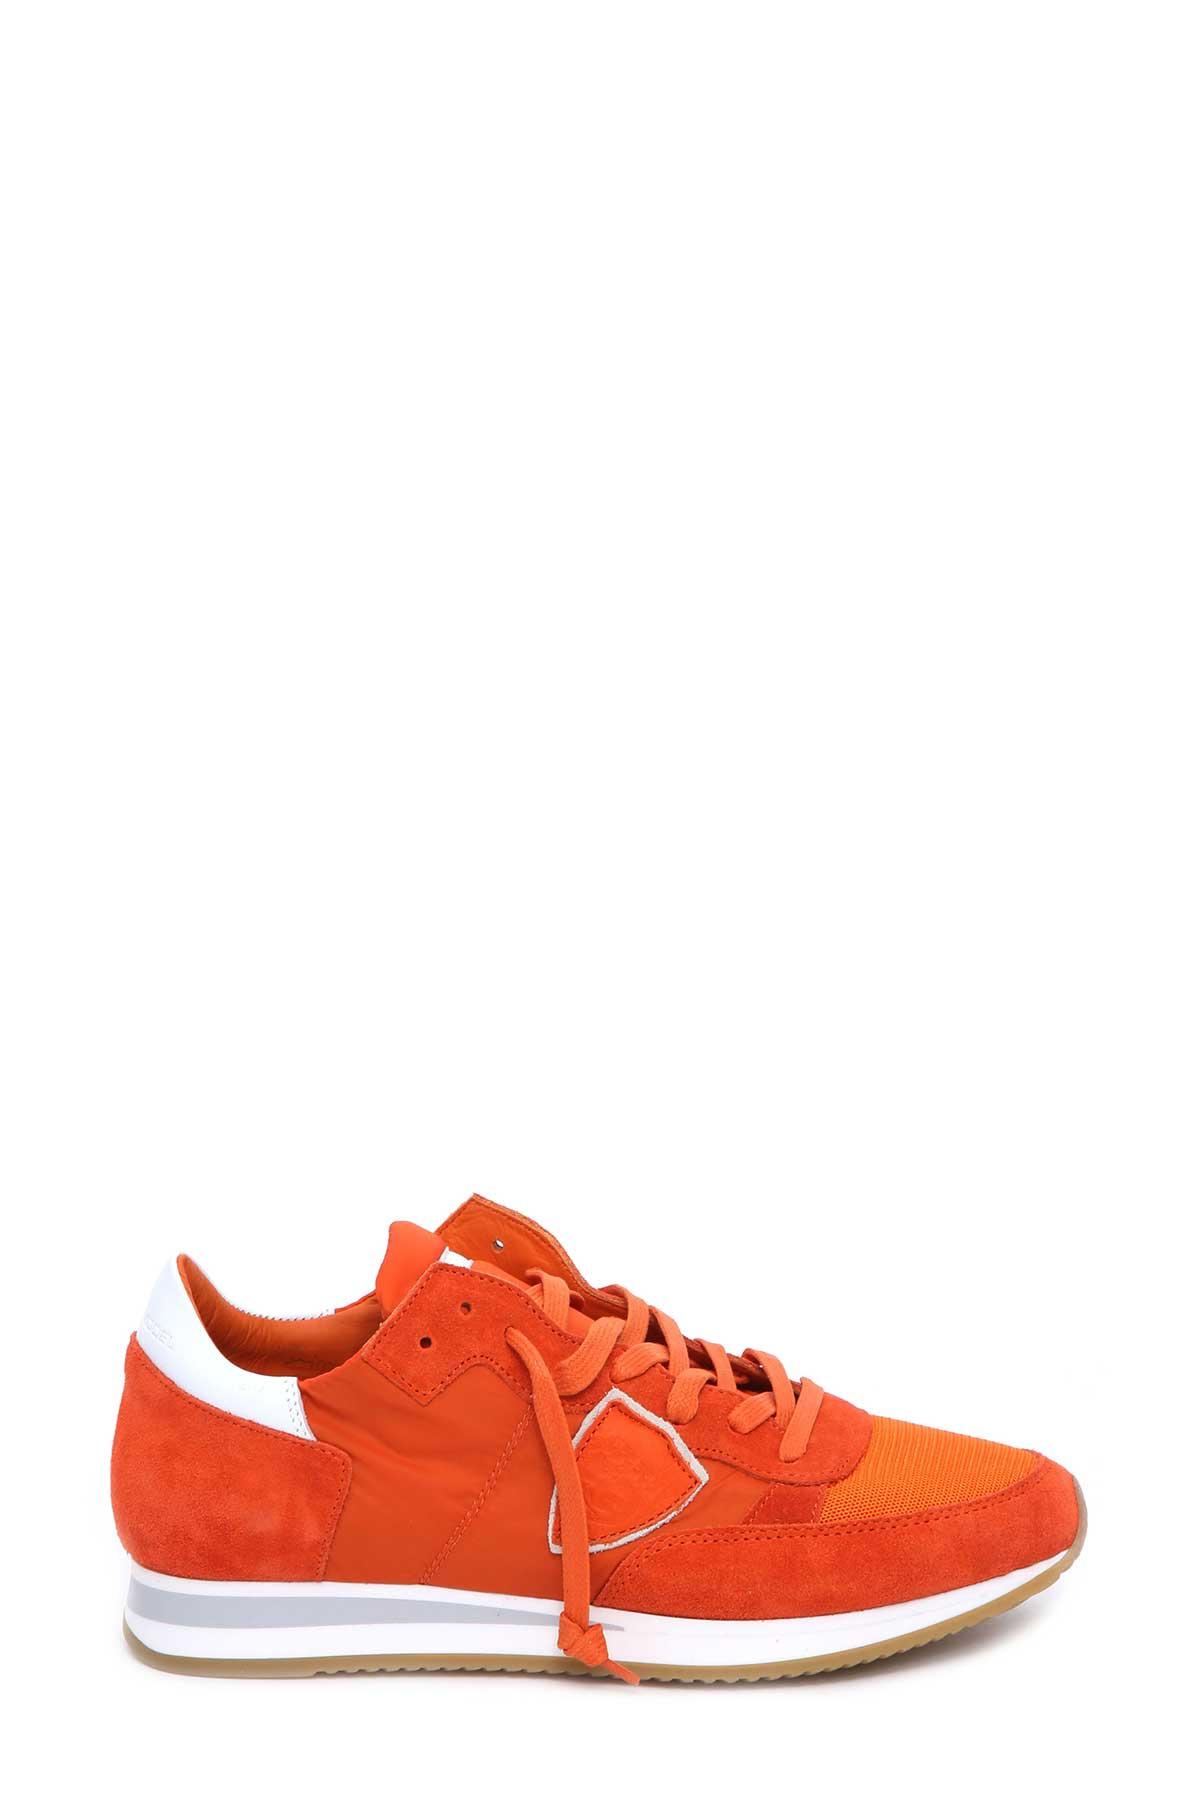 Philippe Model Philippe Model tropez Sneaker